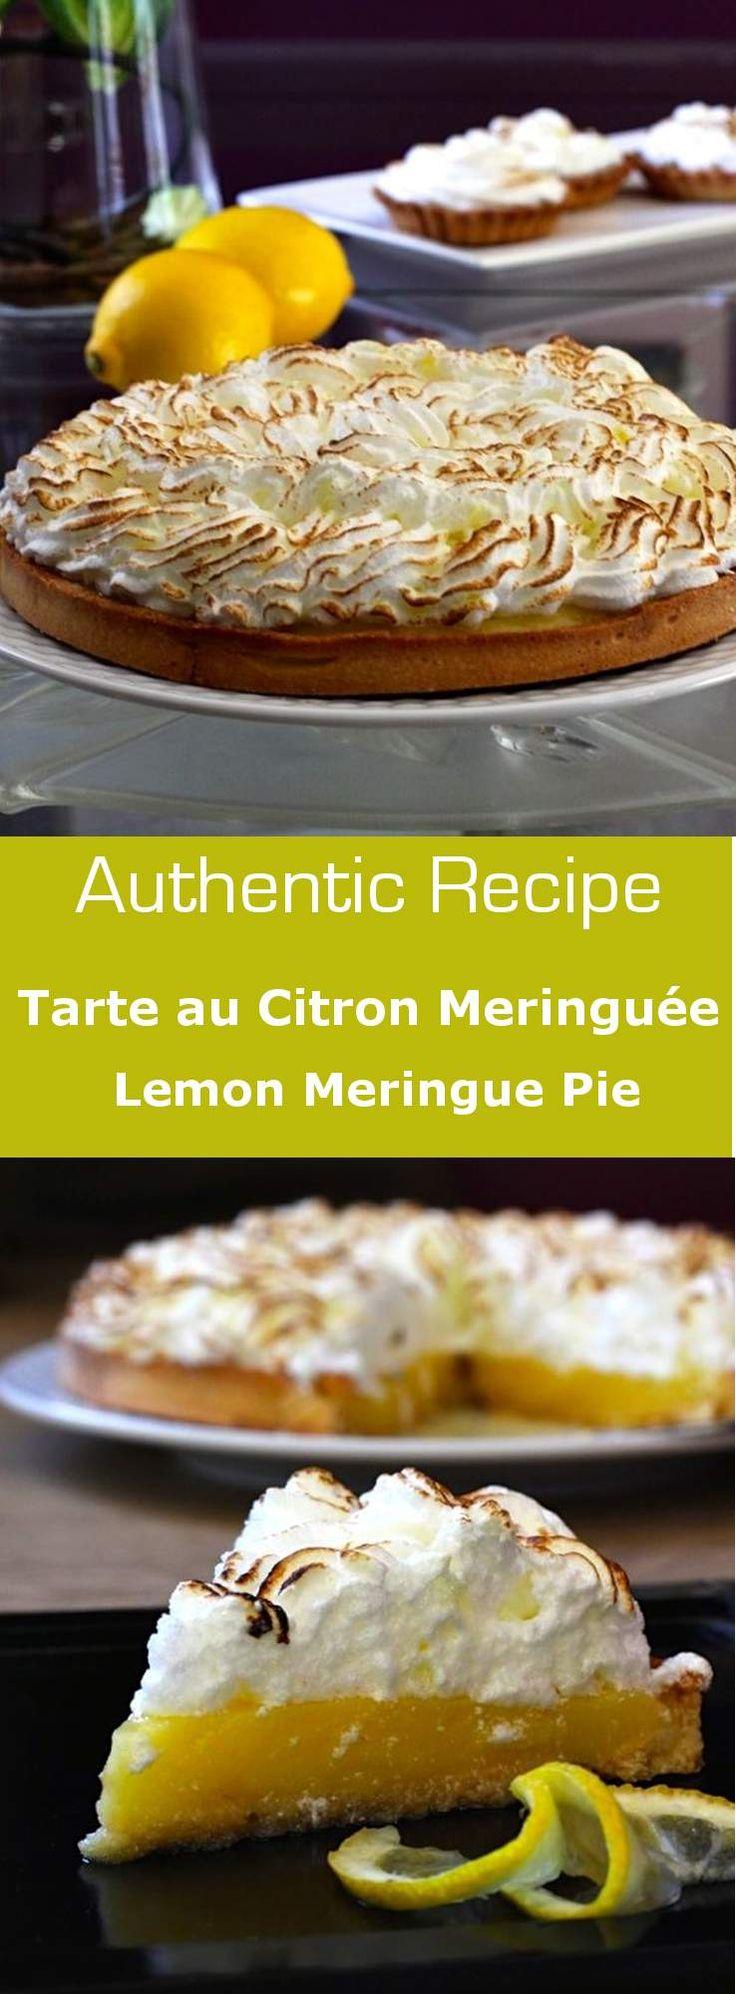 Lemon meringue pie is a delicious dessert combining the acidity of lemon with the sweetness of the meringue.